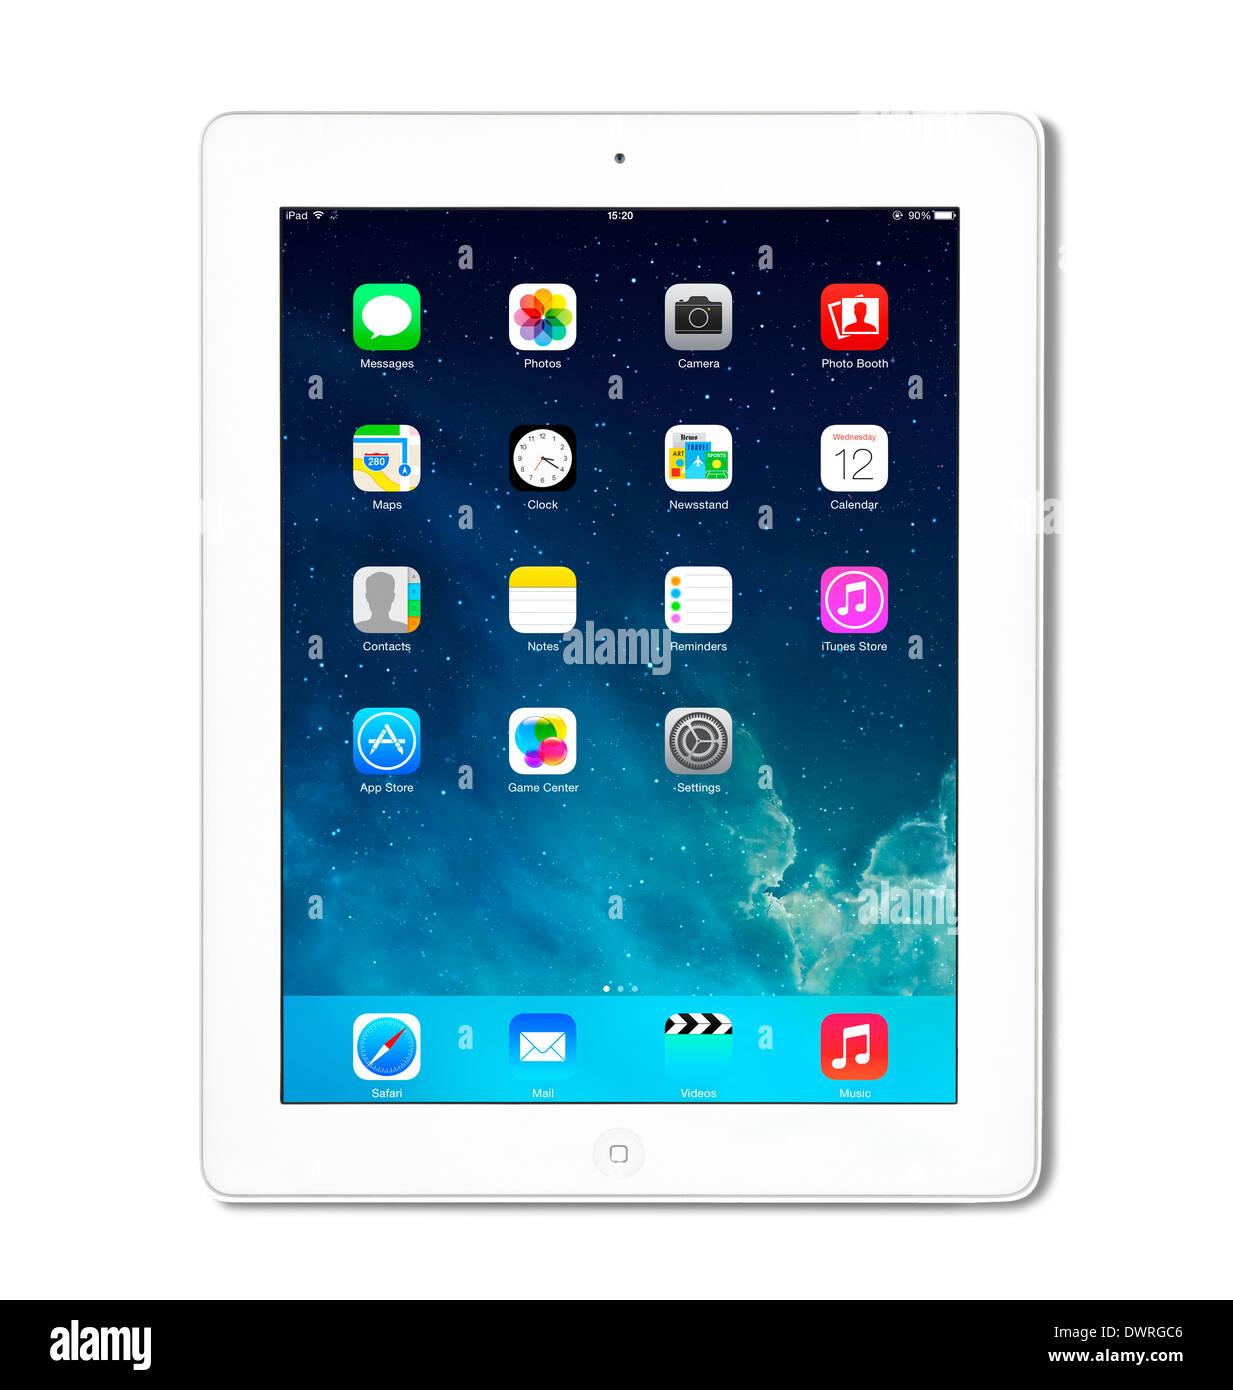 iOS 7.1 home screen on an Apple iPad 4th generation retina display tablet computer - Stock Image